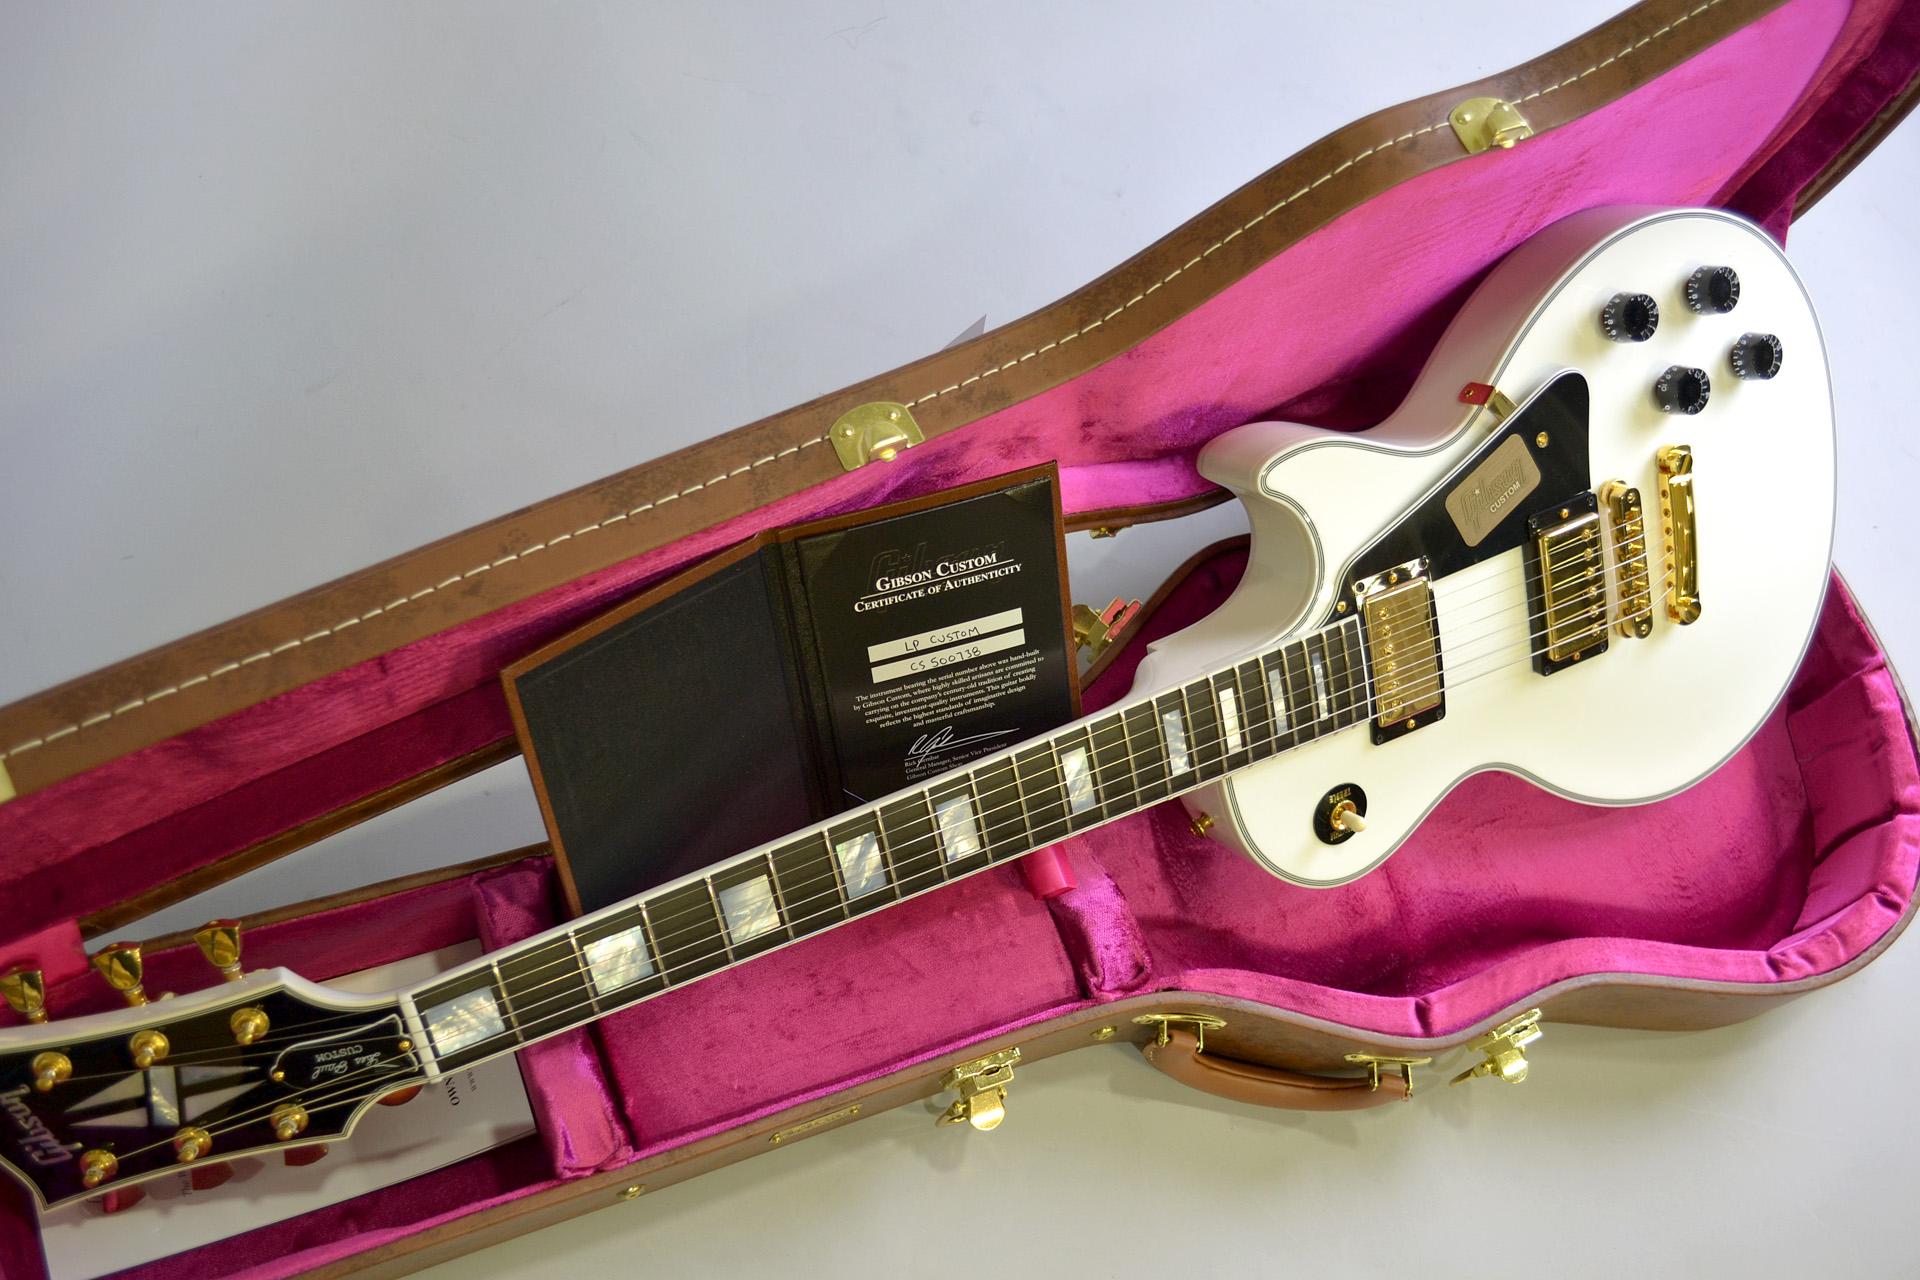 Les Paul Custom【Alpine White】のケース・その他画像